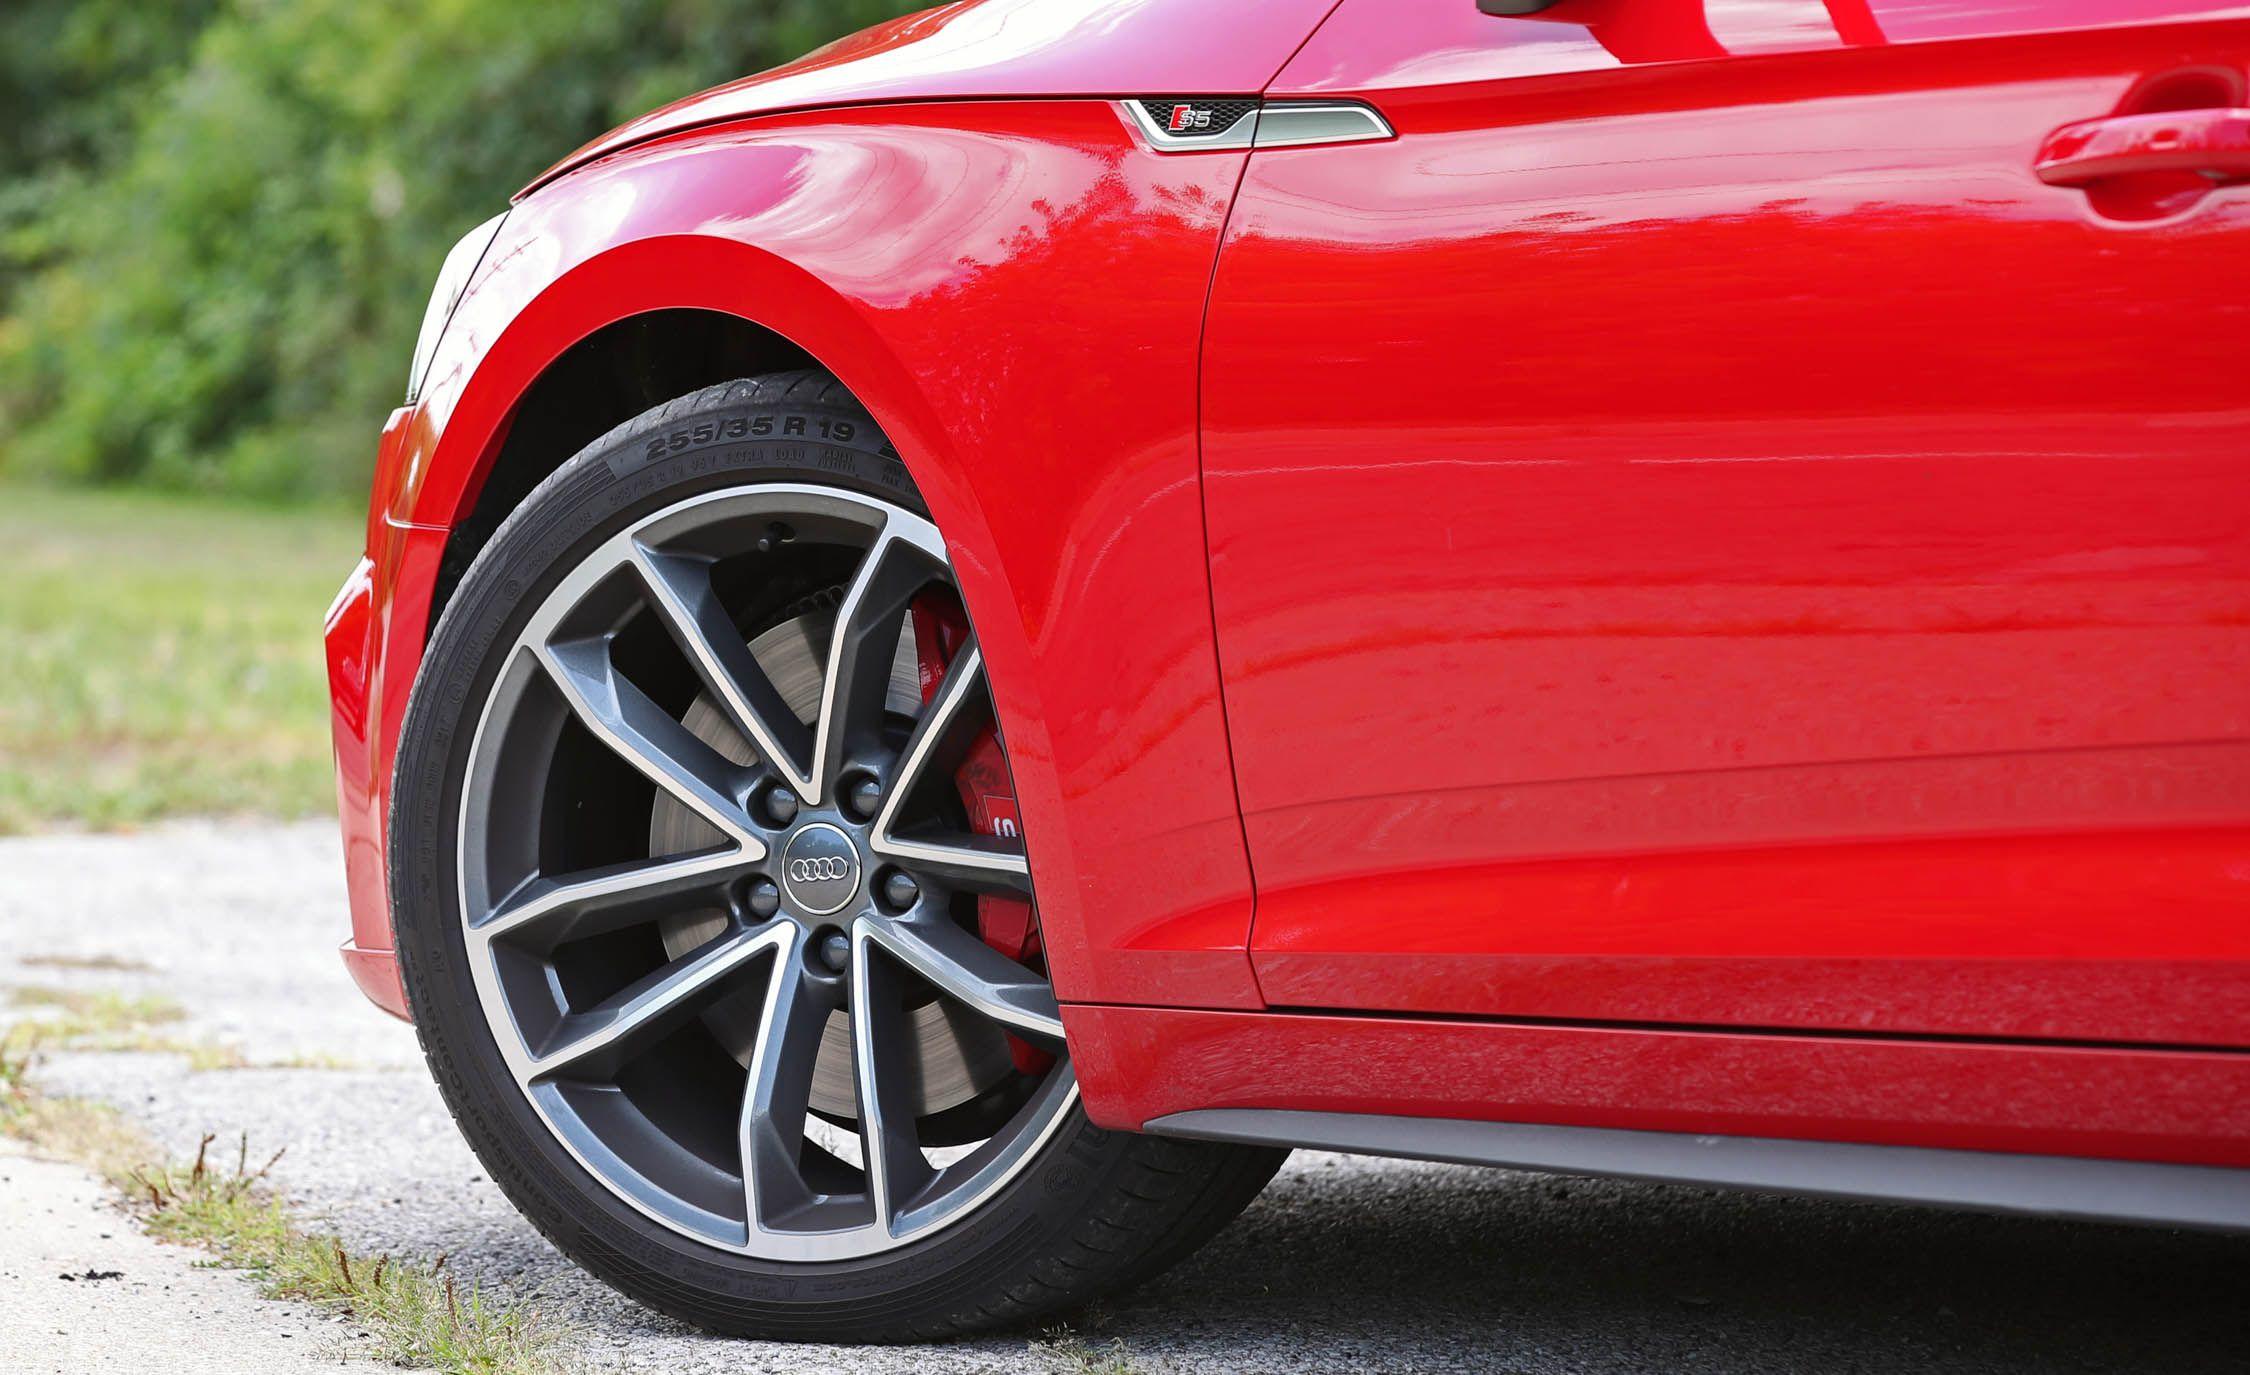 2018 Audi S5 Sportback Photo Gallery